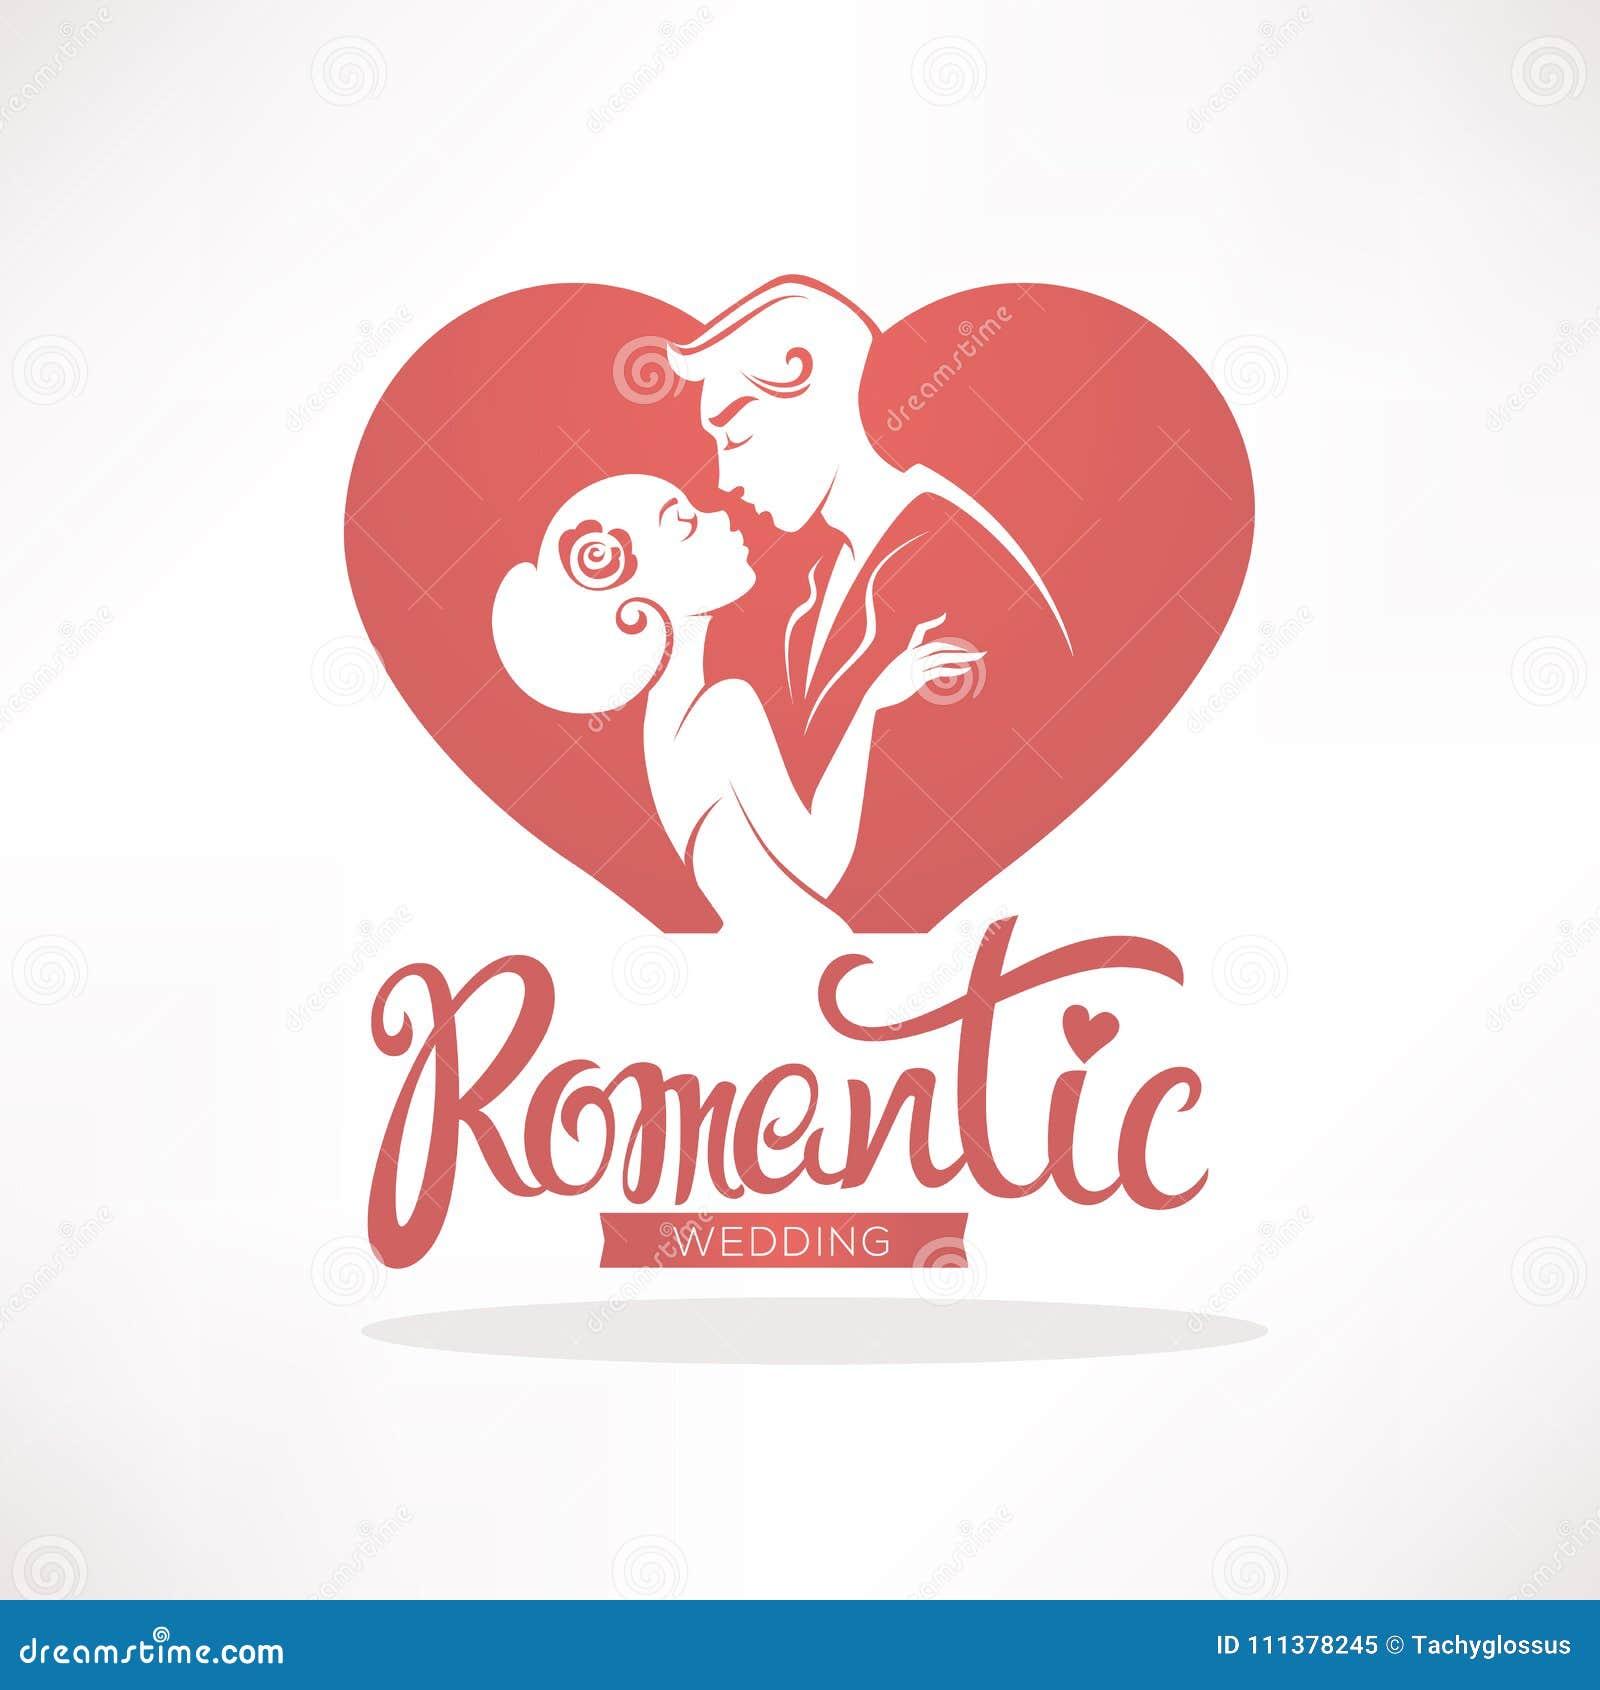 Romantic Wedding, Vector Logo, Emblem, Sticker For Your Wedding ...